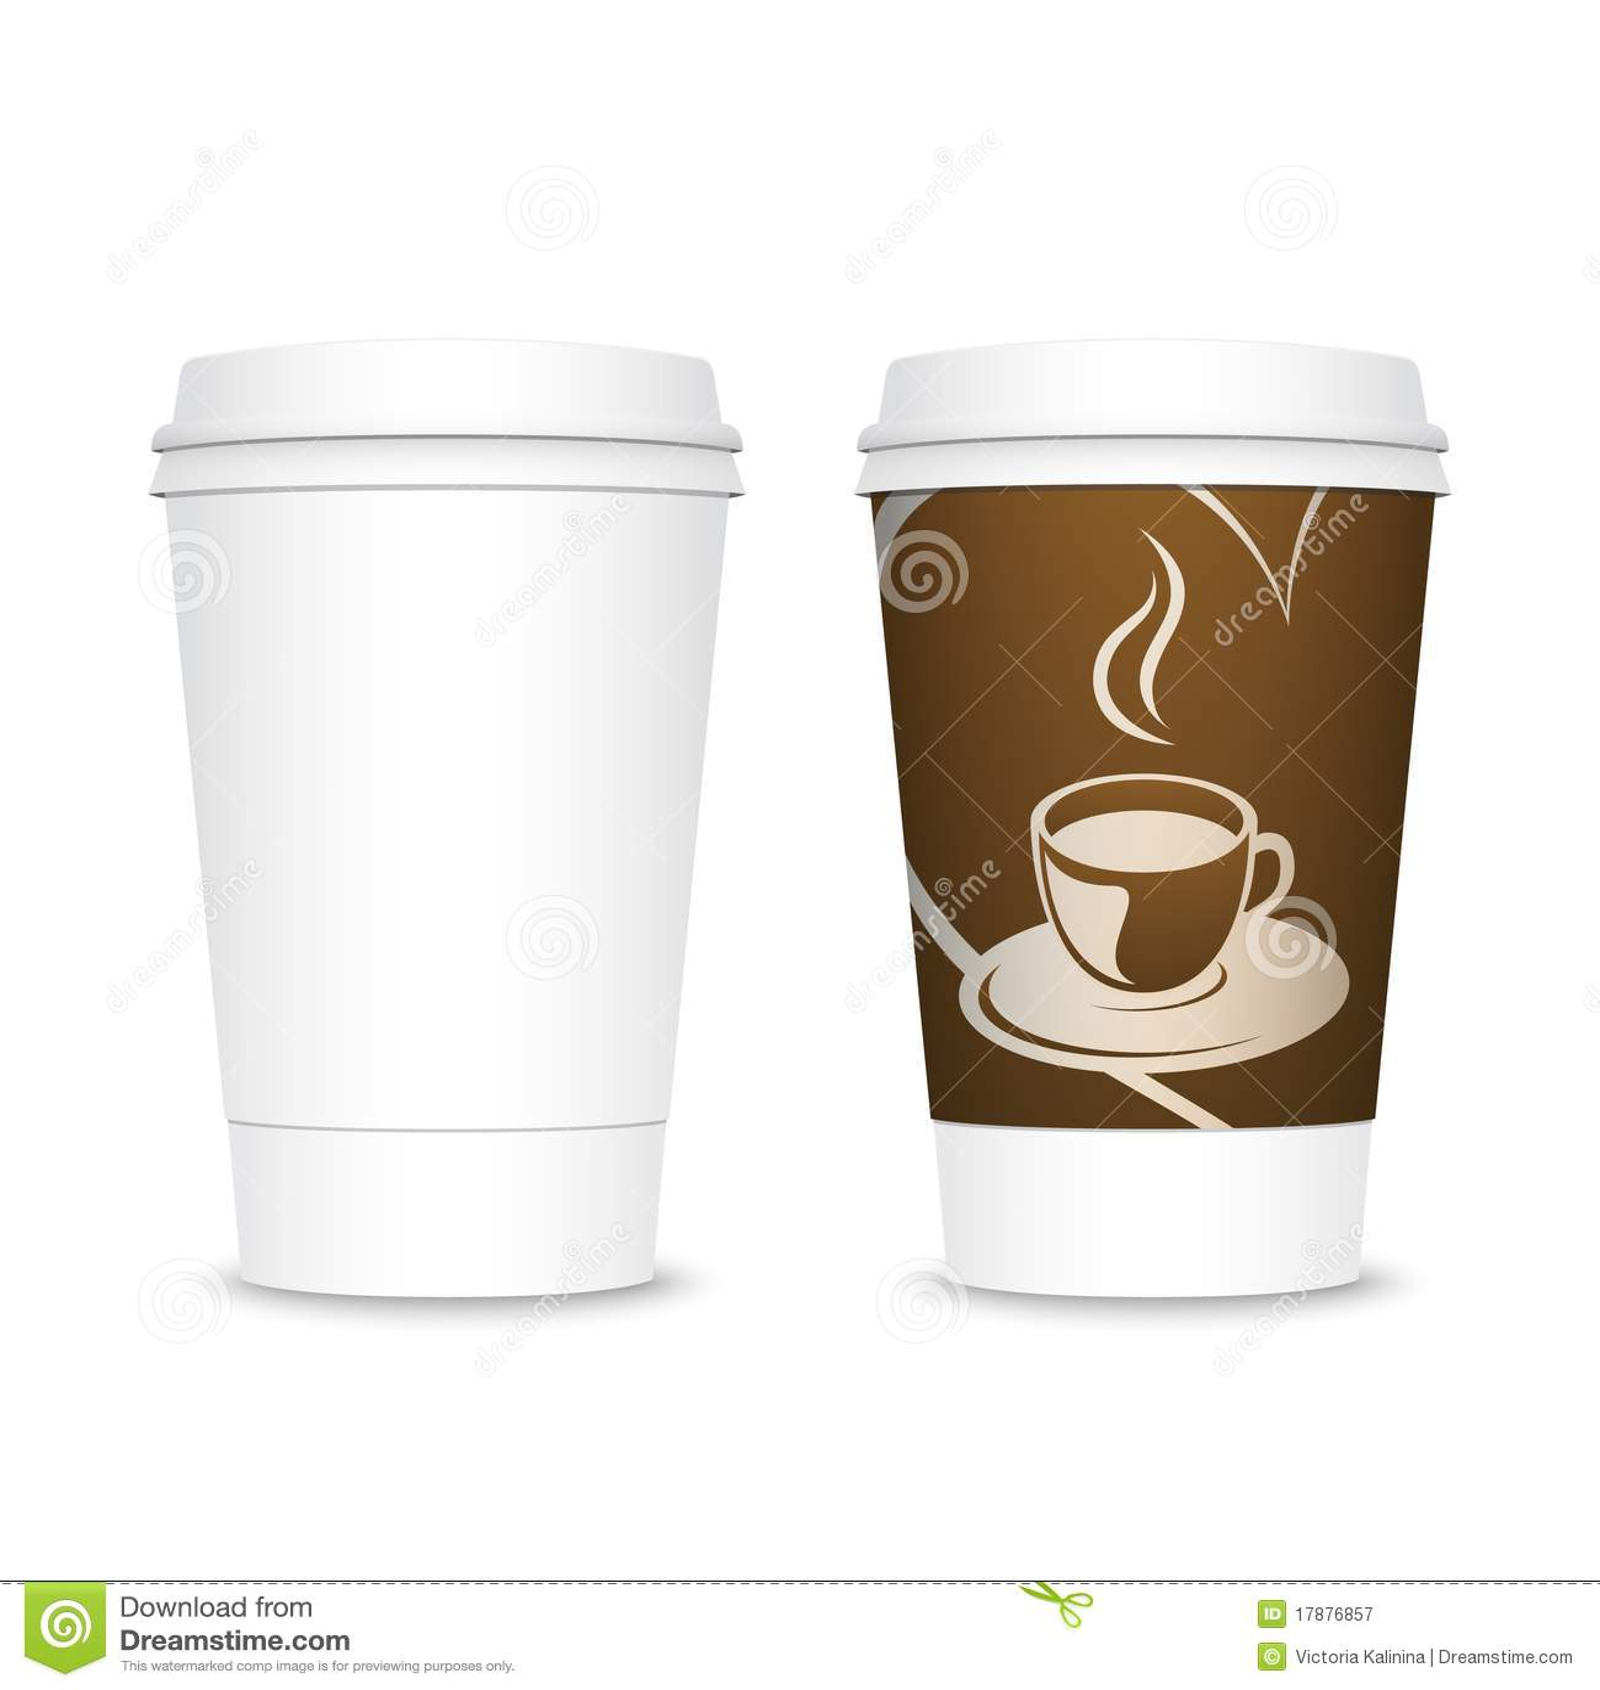 Tazas de caf para llevar pl sticas fotograf a de archivo for Cafe para llevar